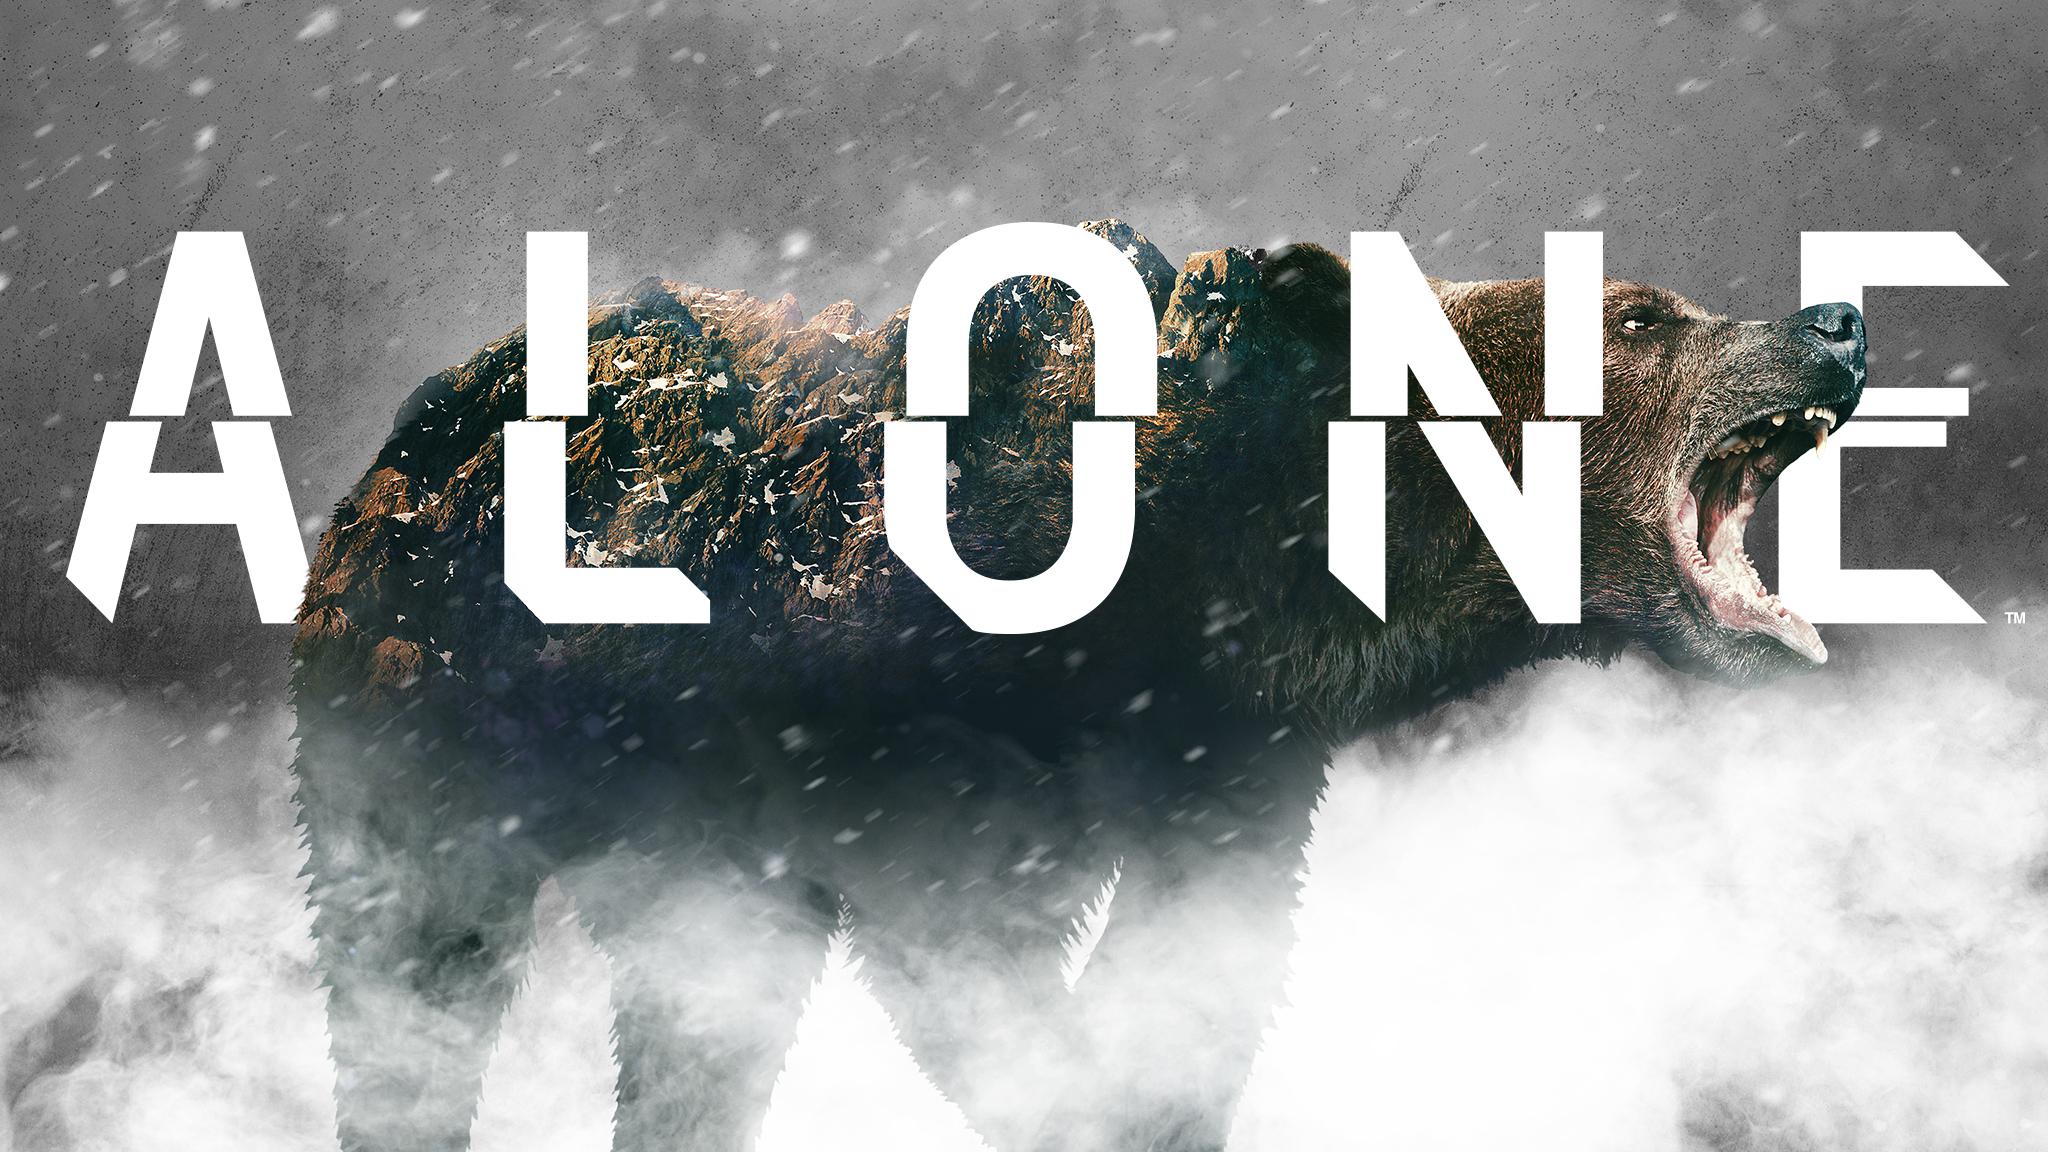 Alone Alt Image